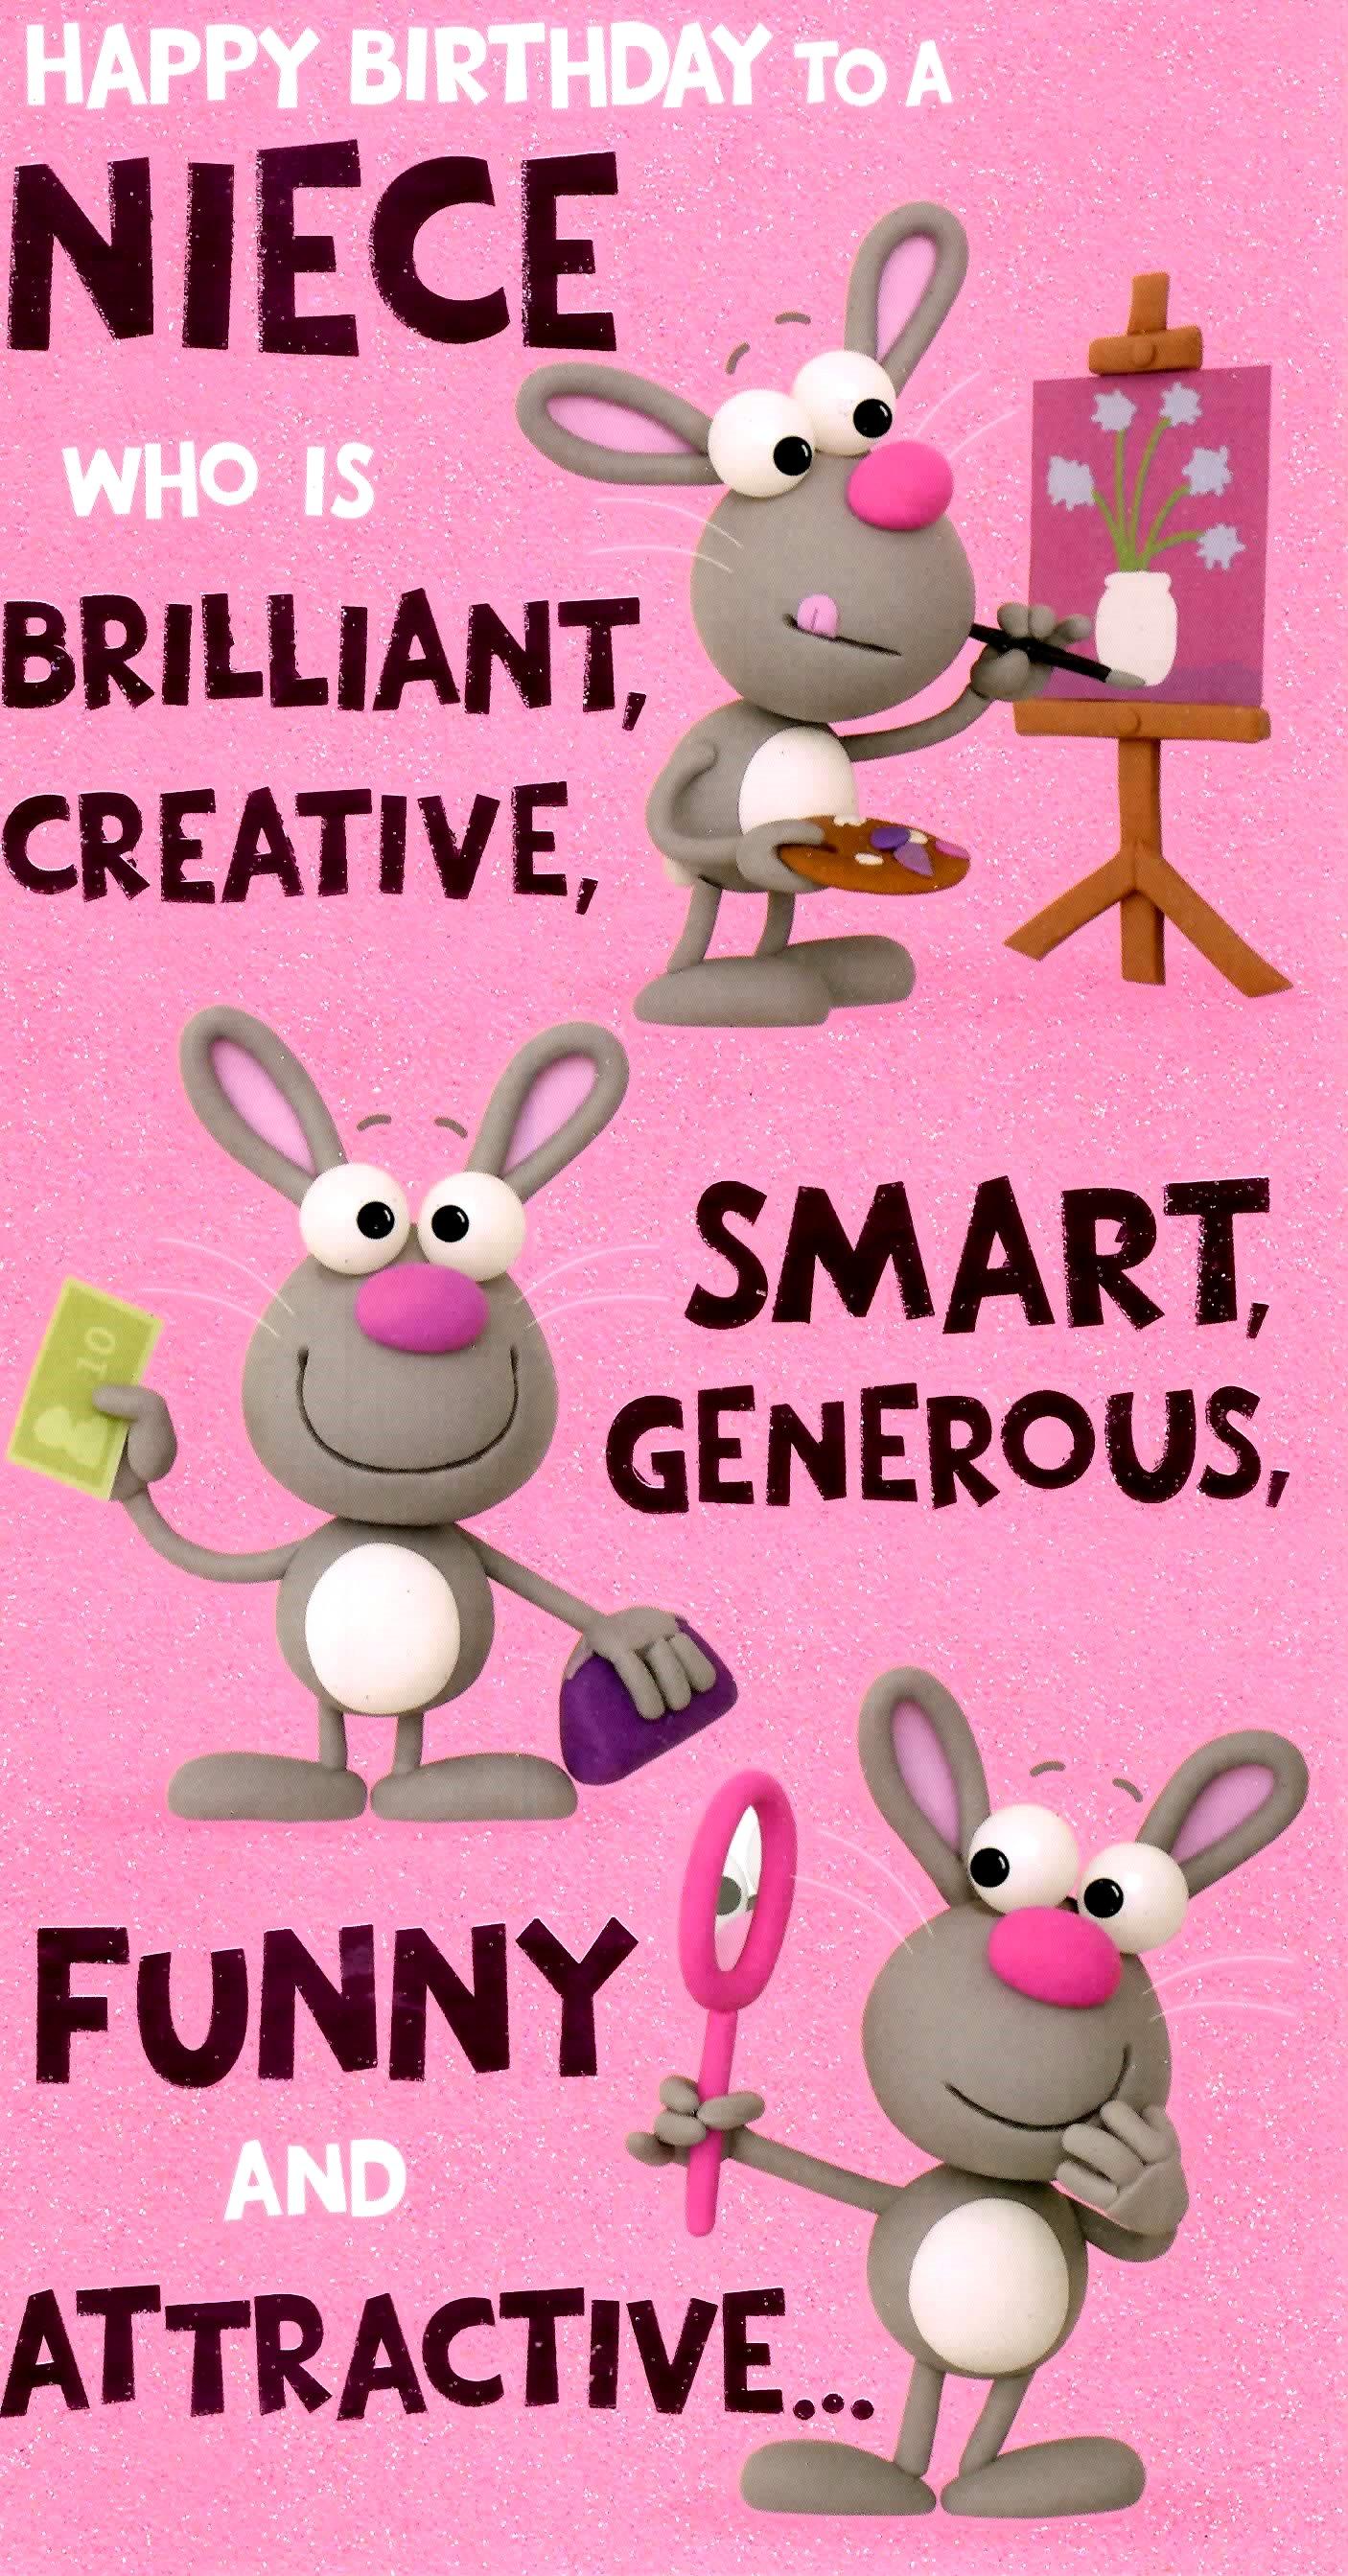 cute funny niece birthday greeting card crackers range cards new, Birthday card